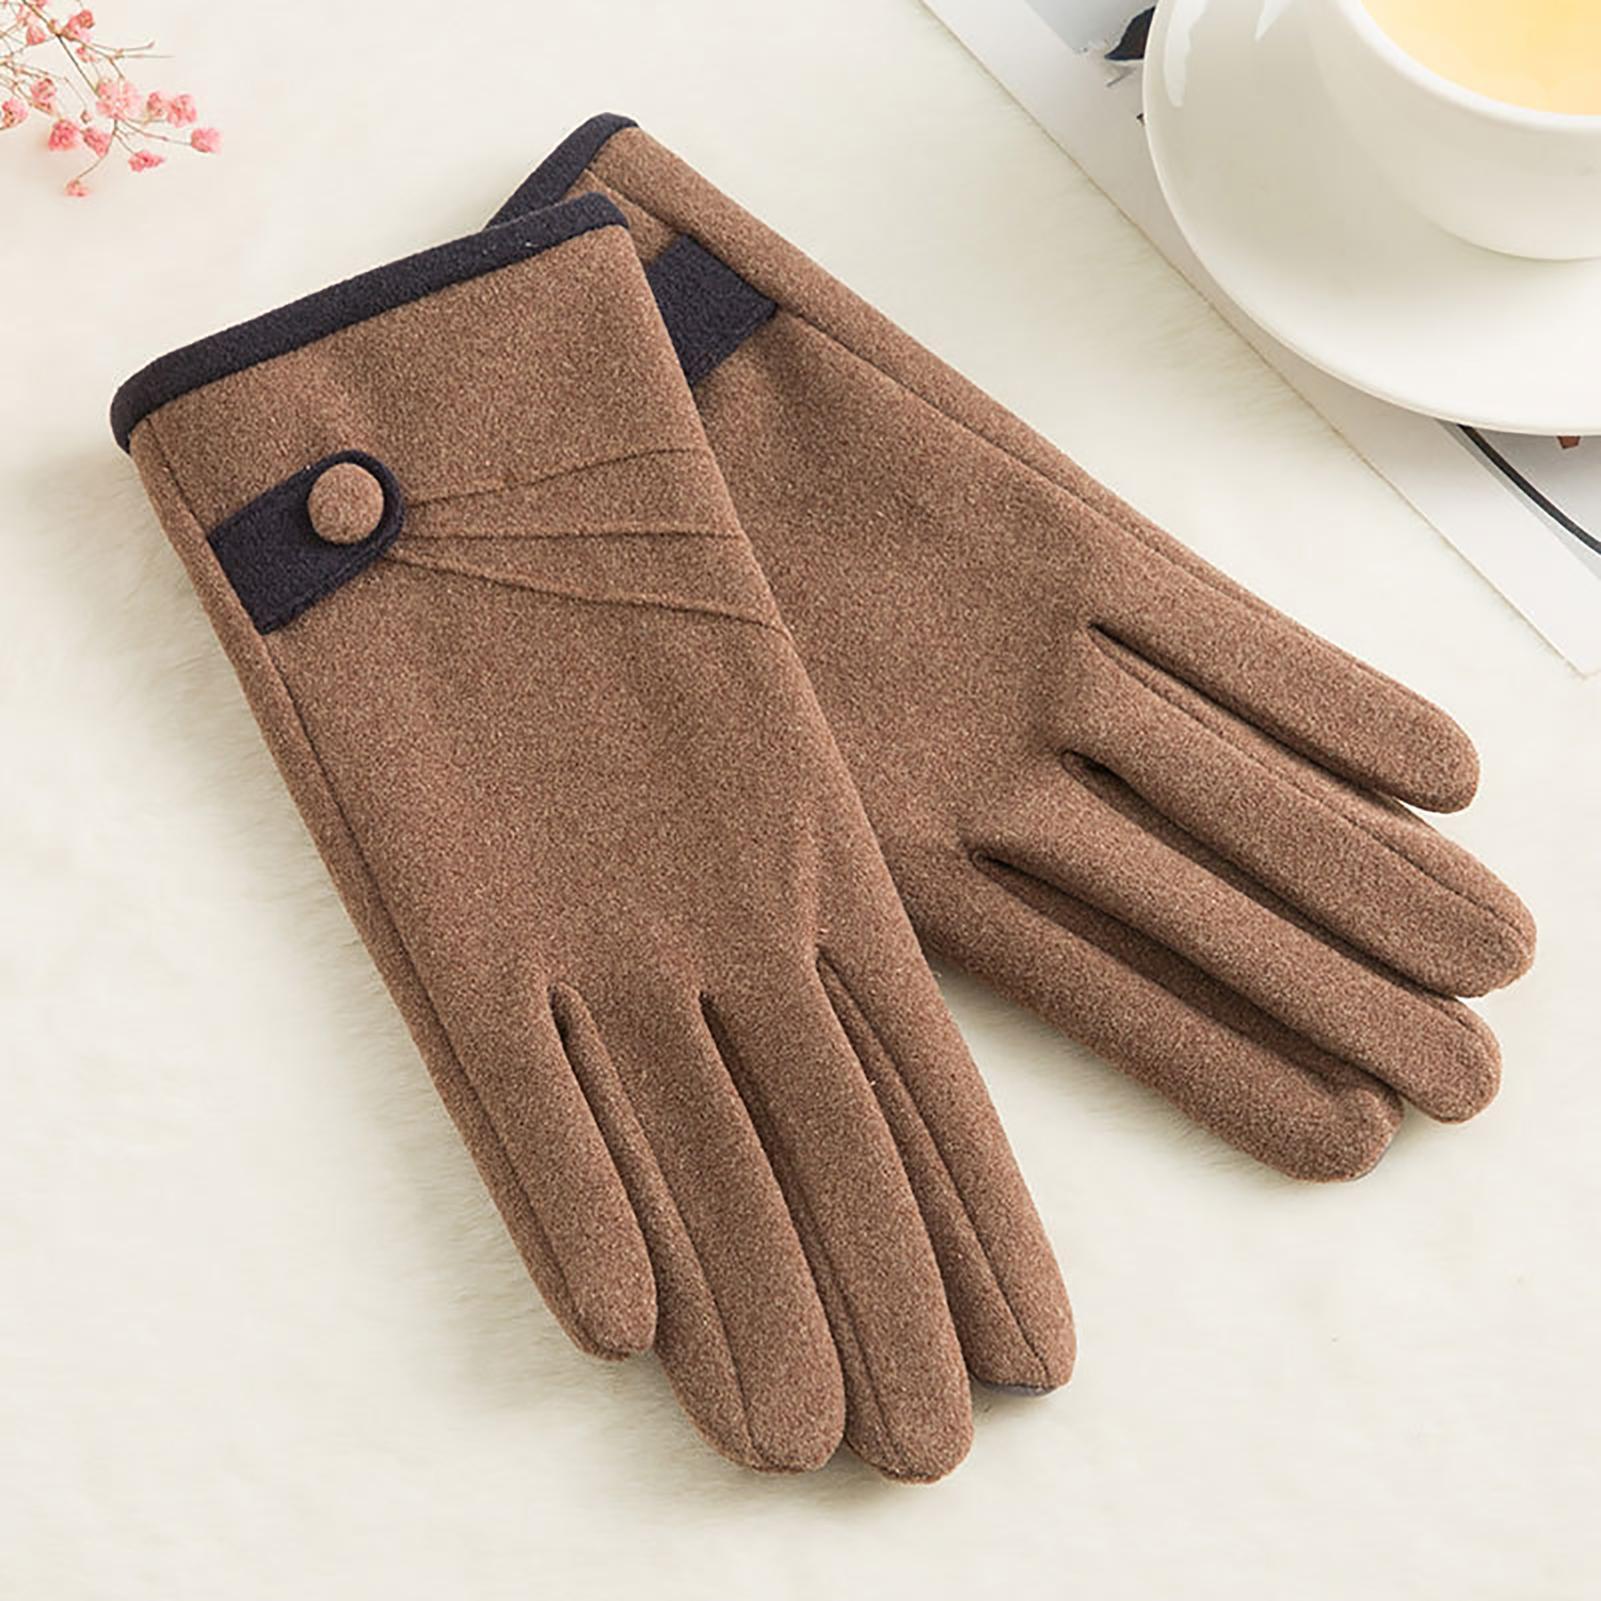 Women Outdoor Winter Touch Screen Warm Gloves Thicken Full Finger Riding Mittens